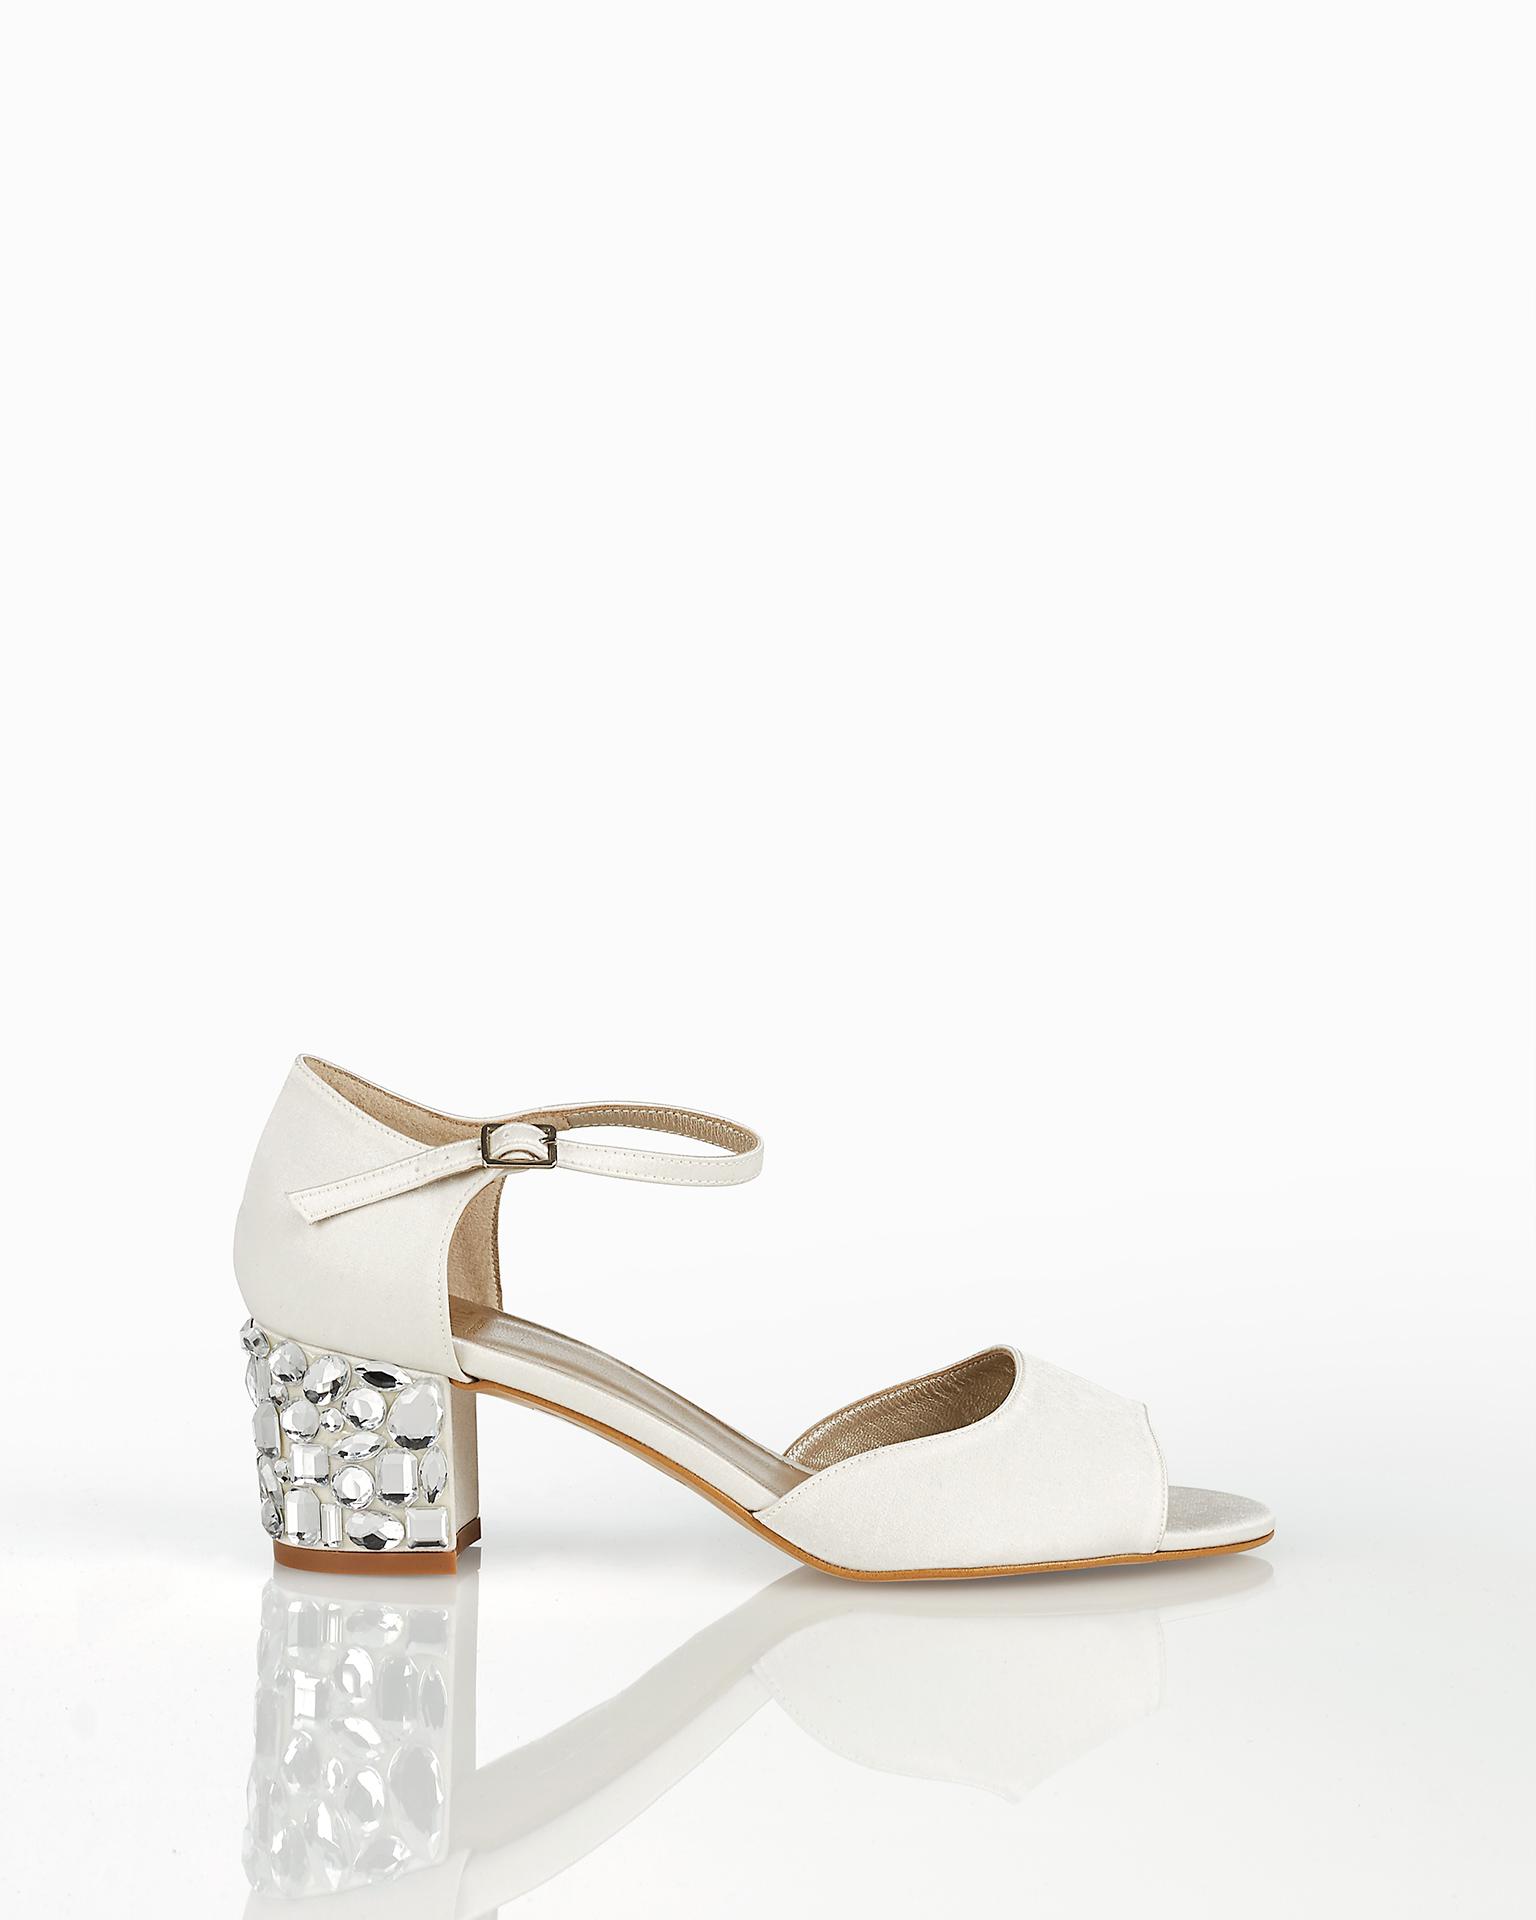 Sandalia de novia en raso, con tacón bajo de pedrería. Colección AIRE BARCELONA 2018.